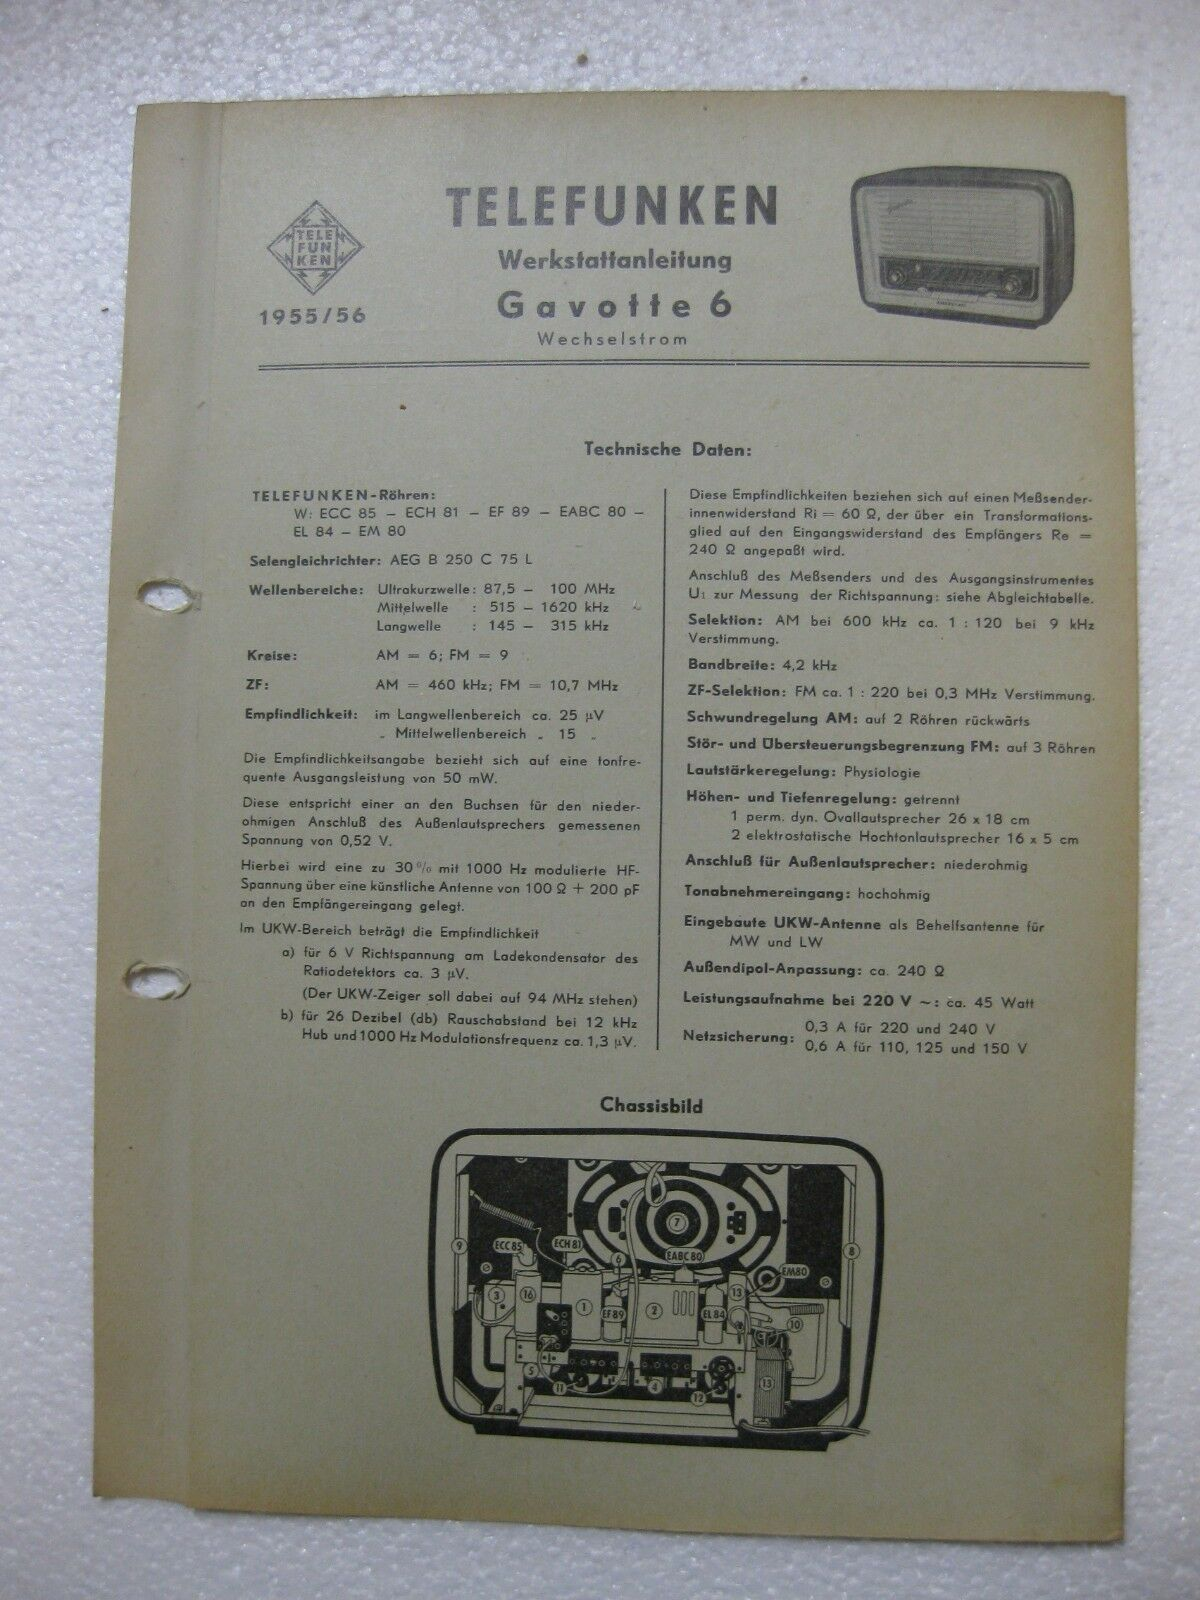 TELEFUNKEN Gavotte 6 Wechselstrom  Schaltplan  Original 1955/56